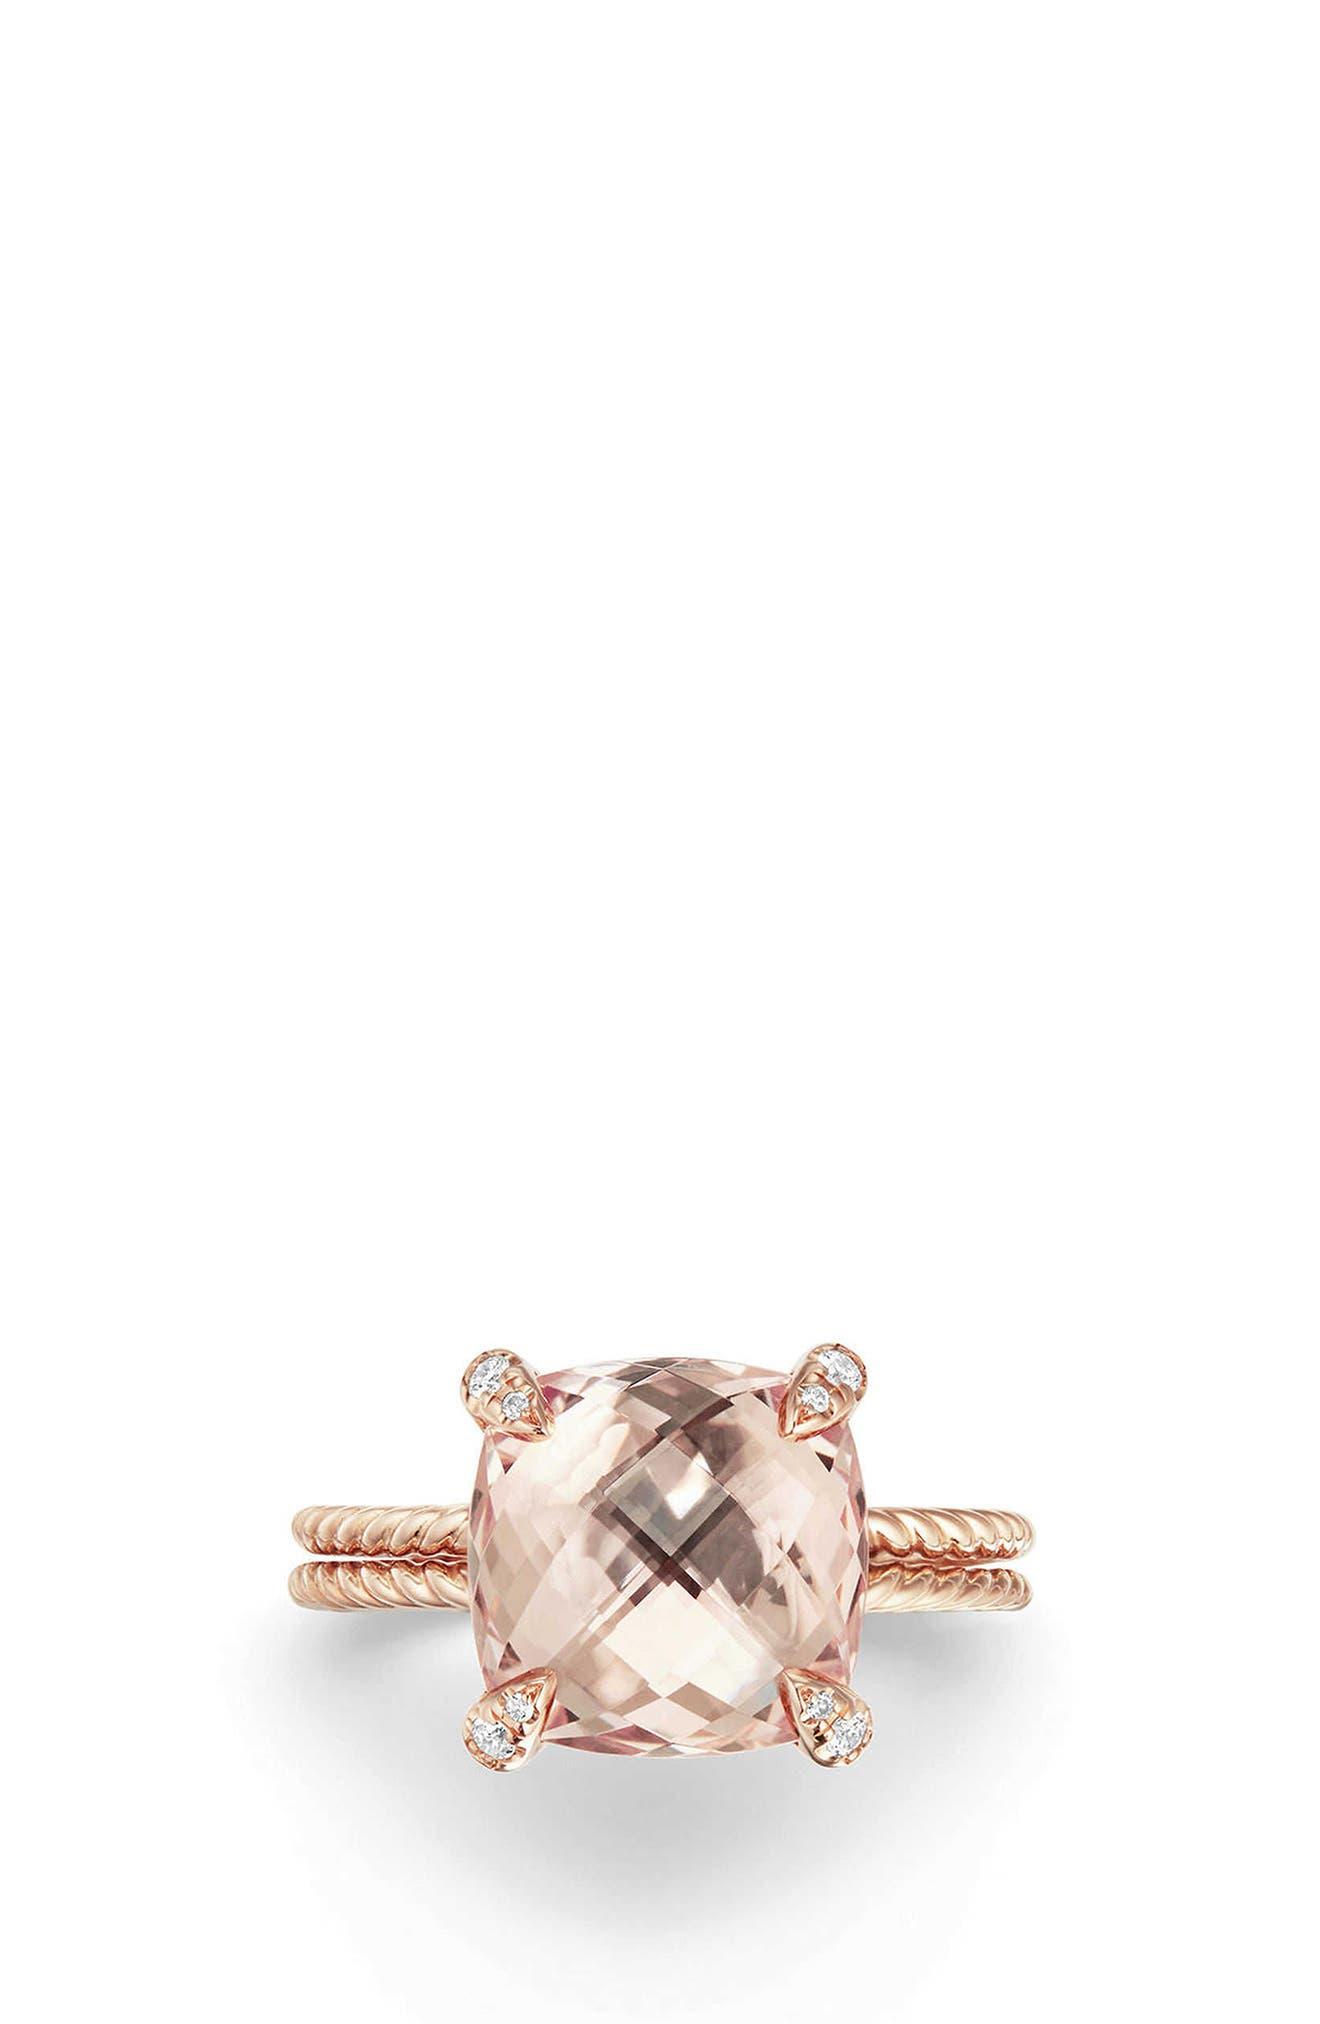 Chatelaine<sup>®</sup> Morganite & Diamond Ring in 18K Rose Gold,                             Main thumbnail 1, color,                             Rose Gold/ Diamond/ Morganite